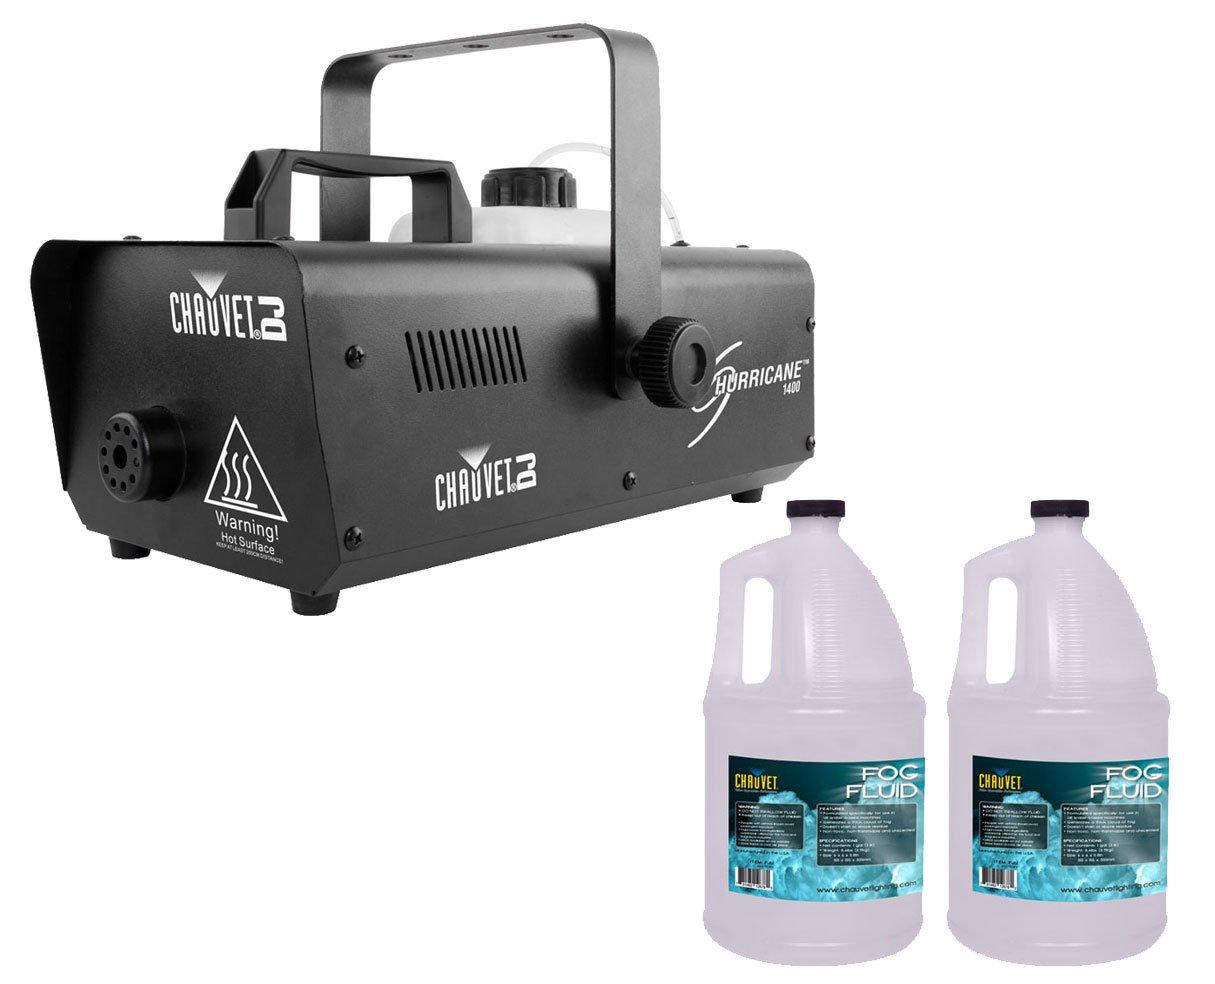 Chauvet H1400 Hurricane 1400 Fog Machine +2x Fog Fluid/Juice Gallon